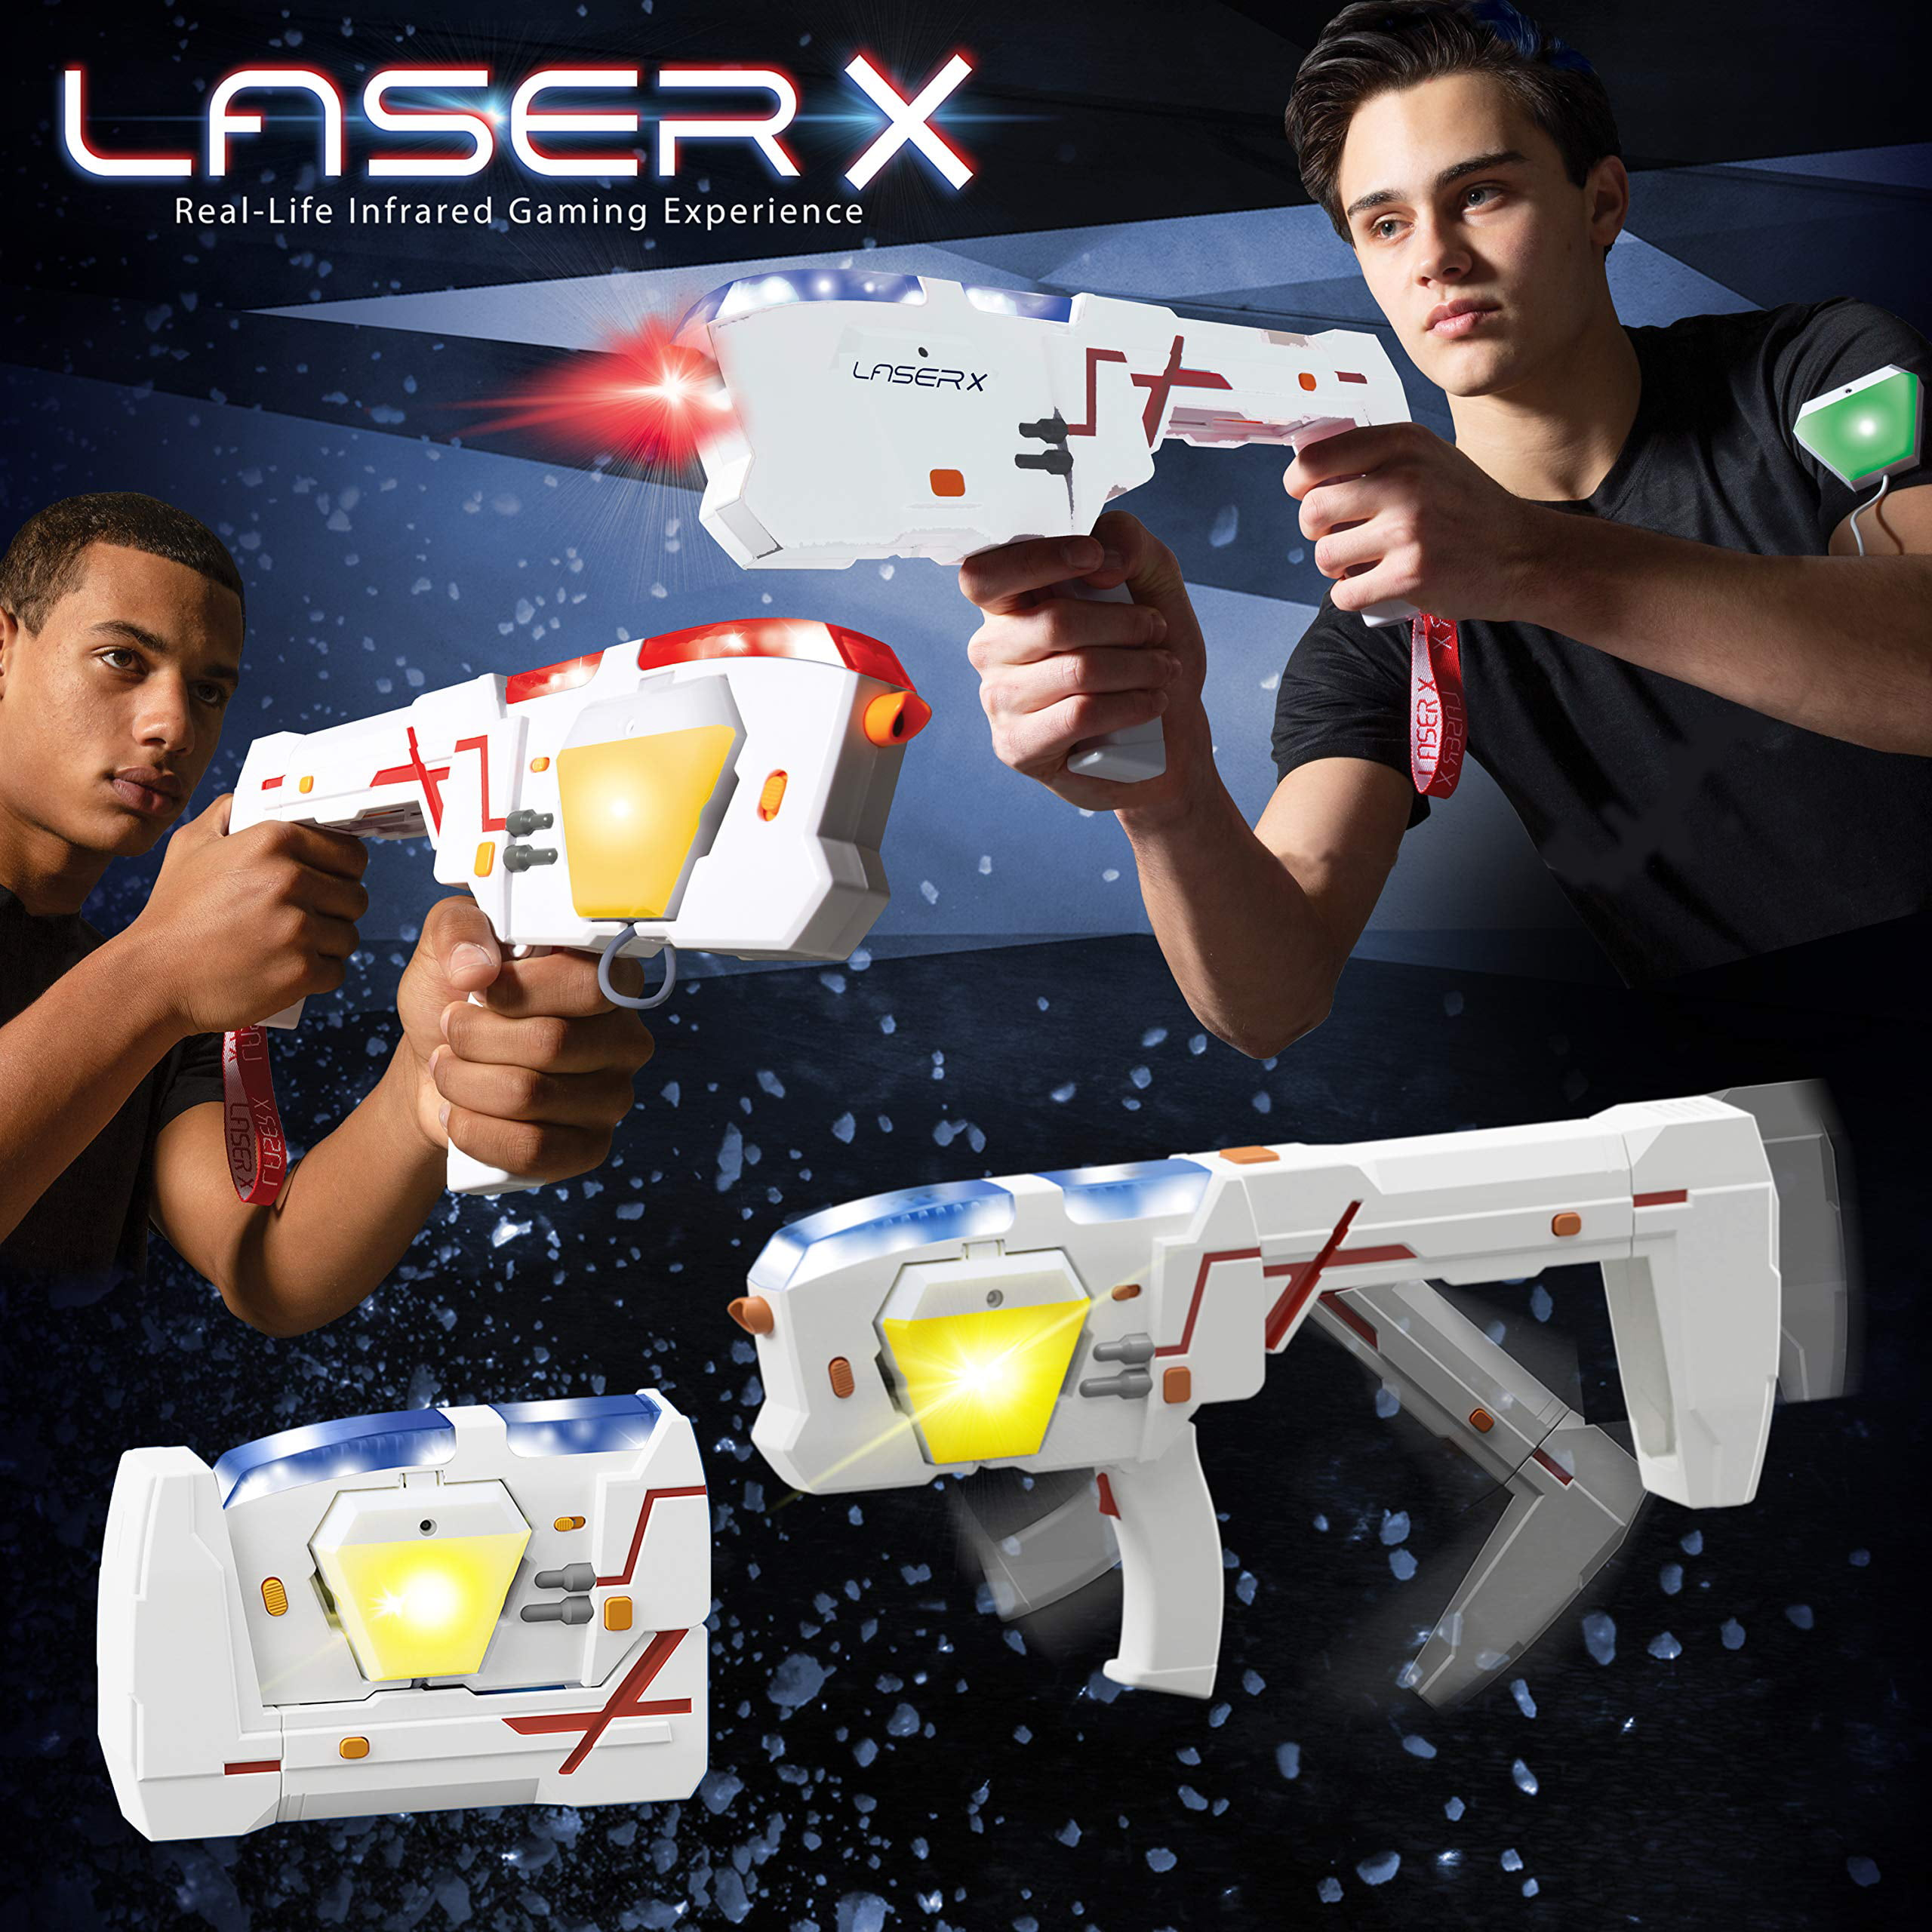 Laser X Morph Double Blasters Walmart com Walmart com